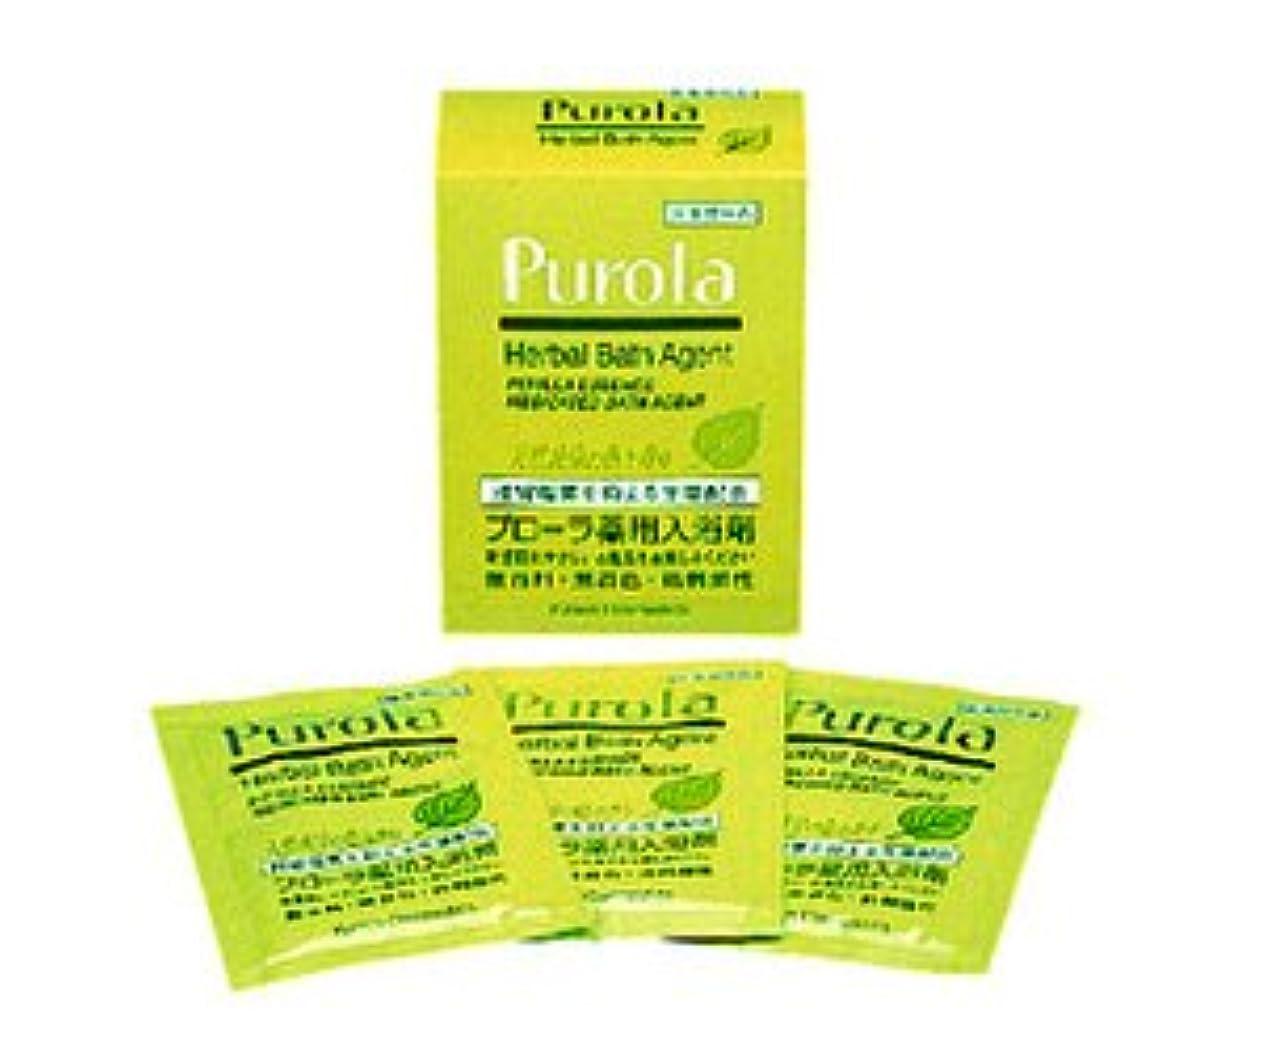 長老下品慢プローラ薬用入浴剤 25g×10包 低刺激性入浴剤